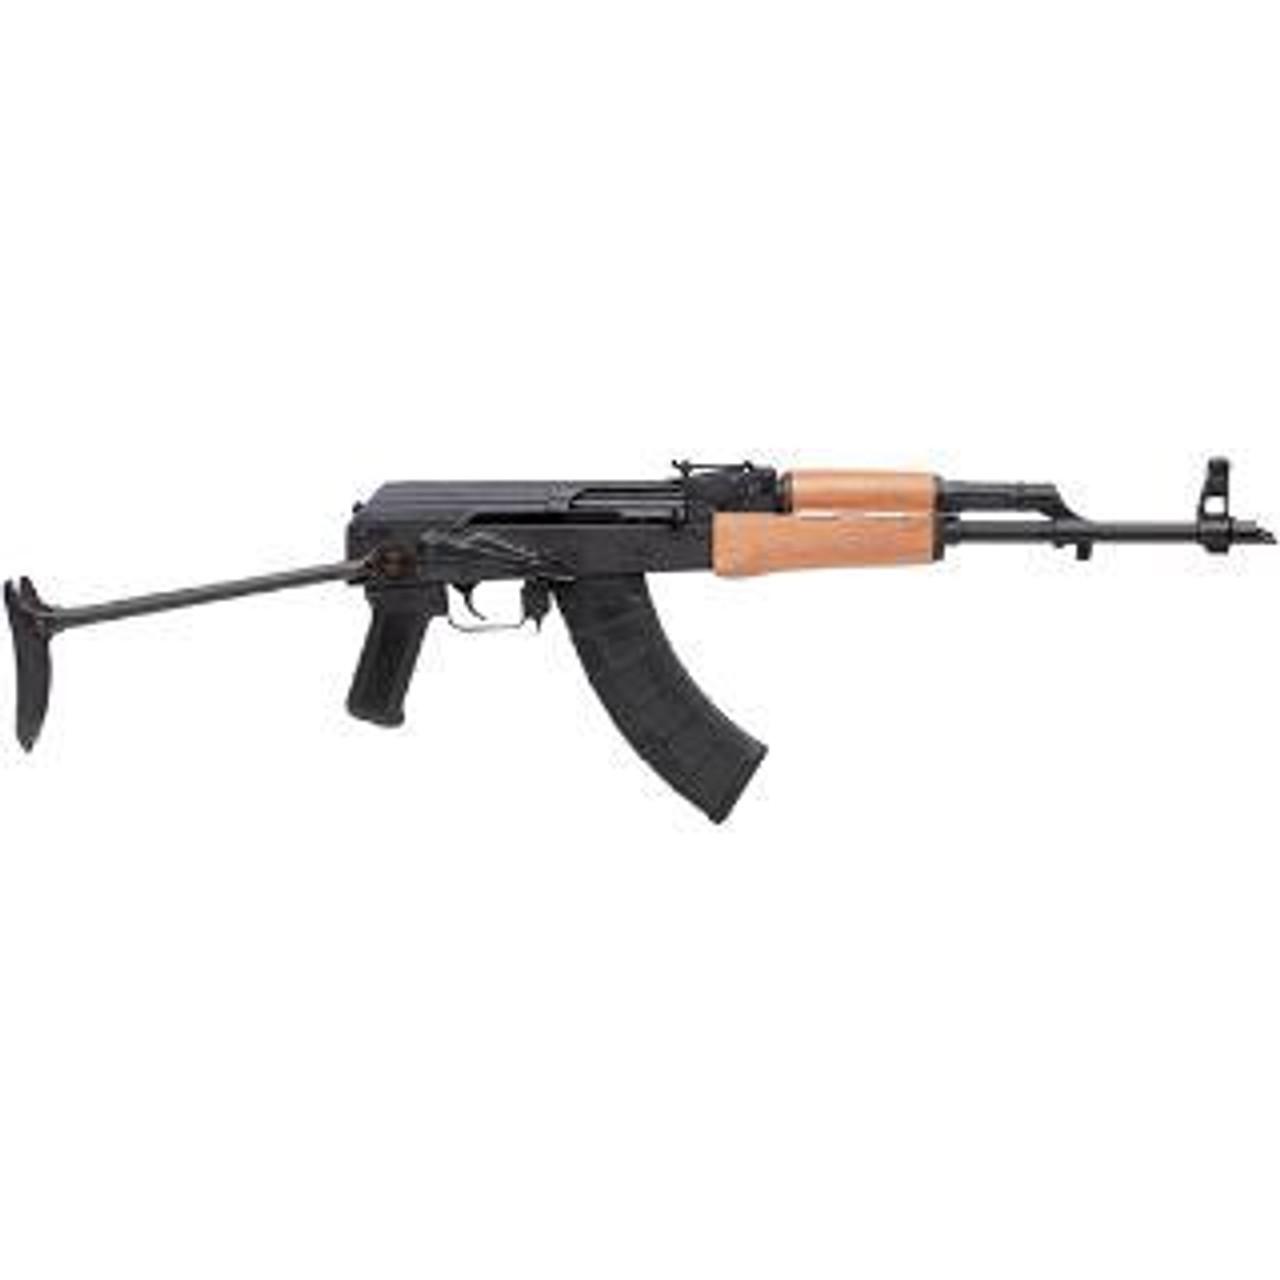 Century Arms GP WASR-10 Underfolder CALIFORNIA 7.62x39